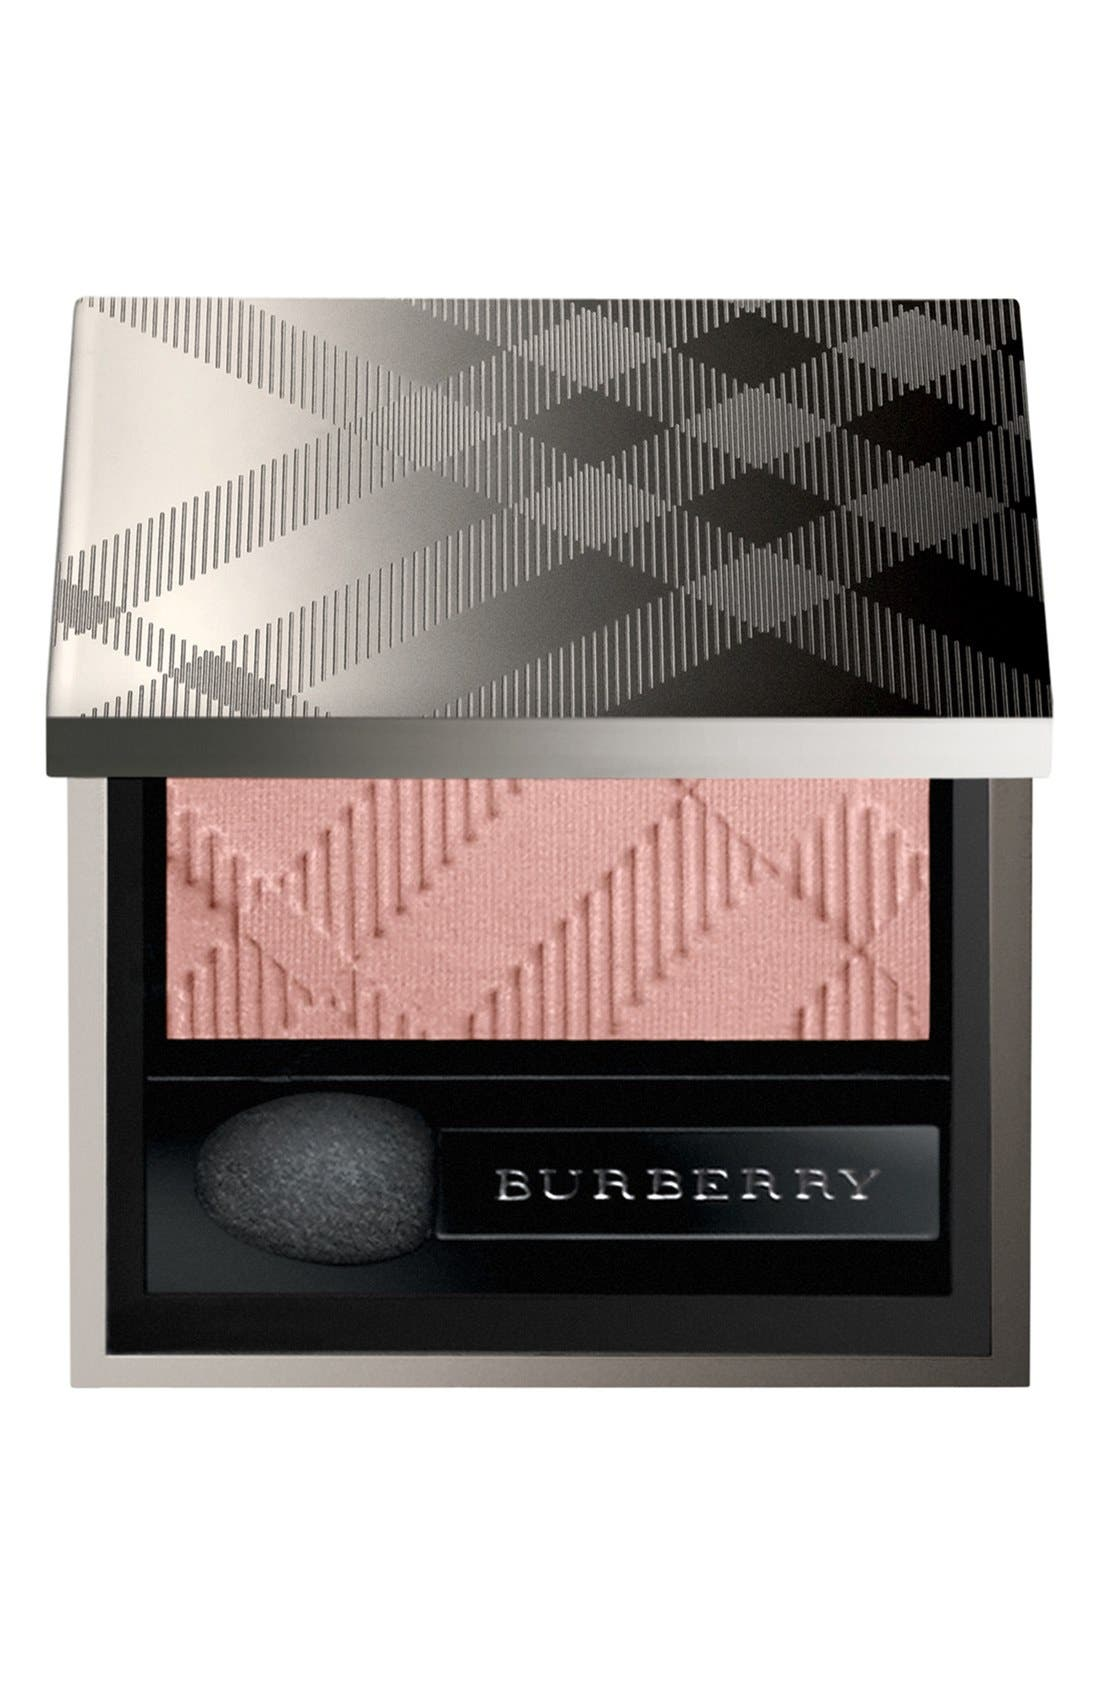 Burberry Beauty Eye Colour - Wet & Dry Silk Eyeshadow